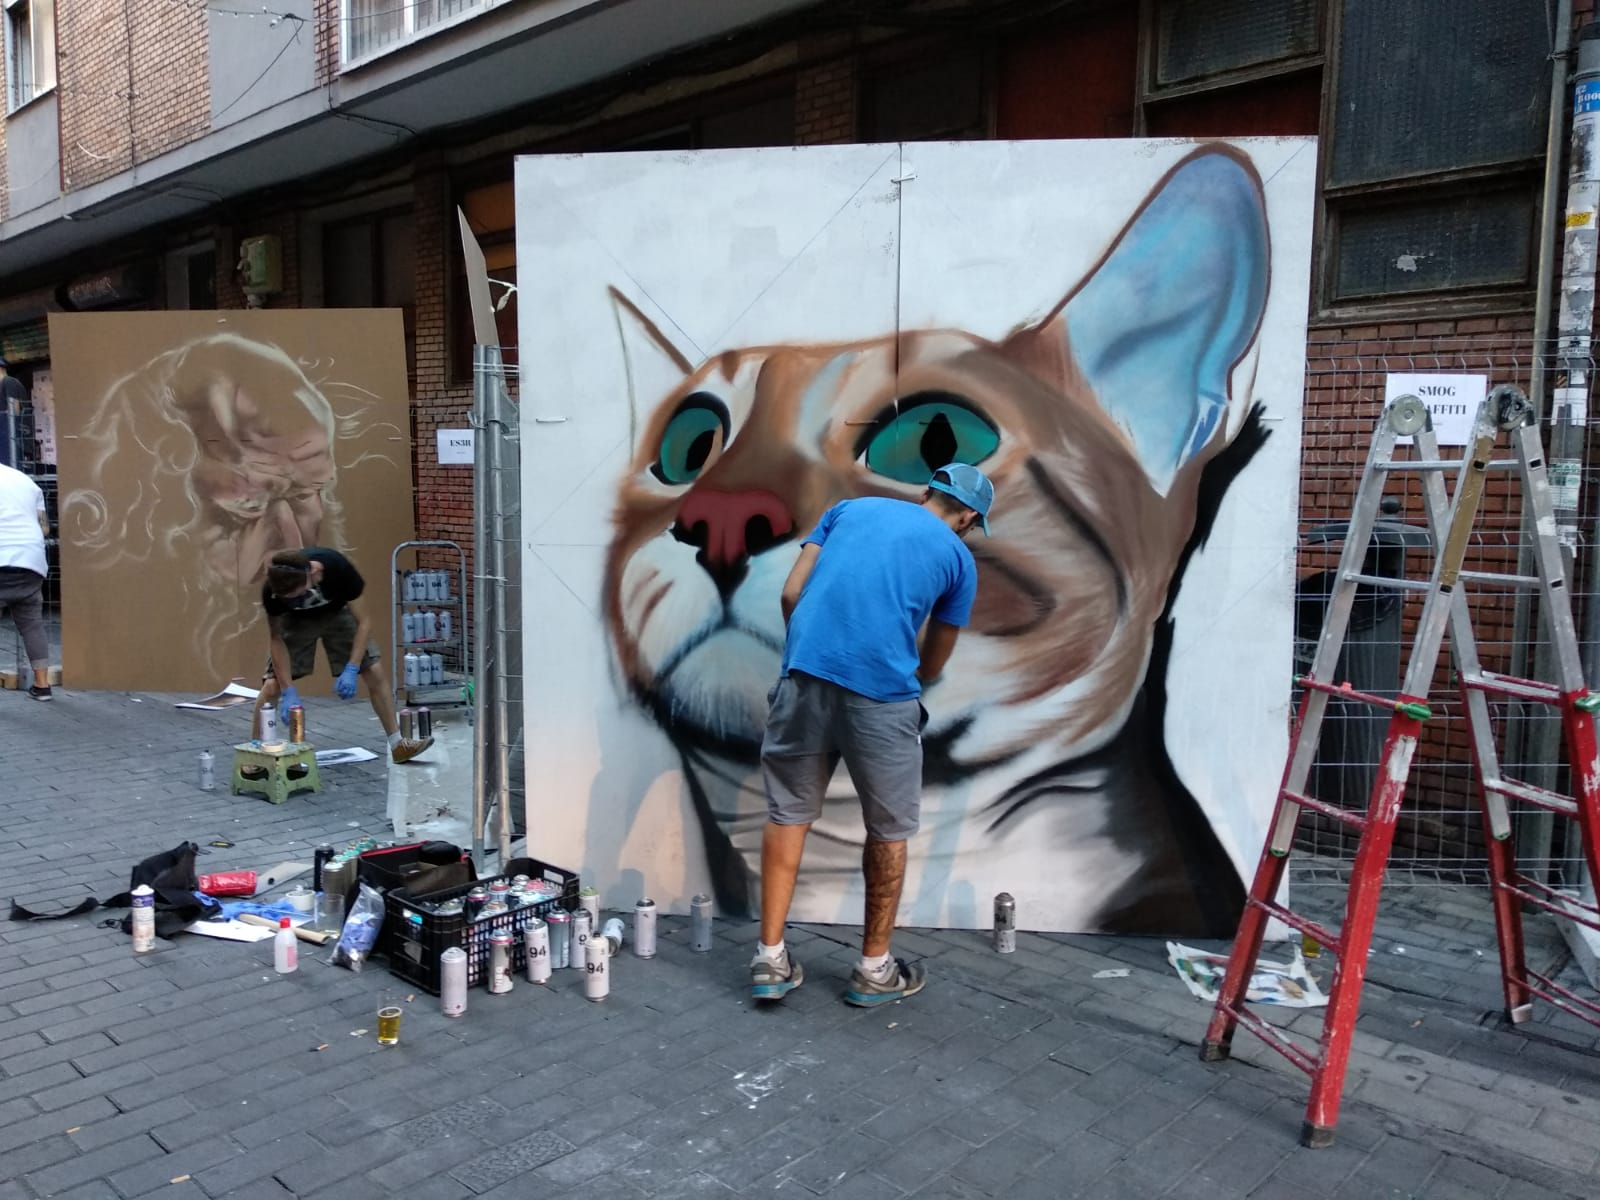 dani smogg graffiti san antolin infame fiestas palencia arte urbano mural